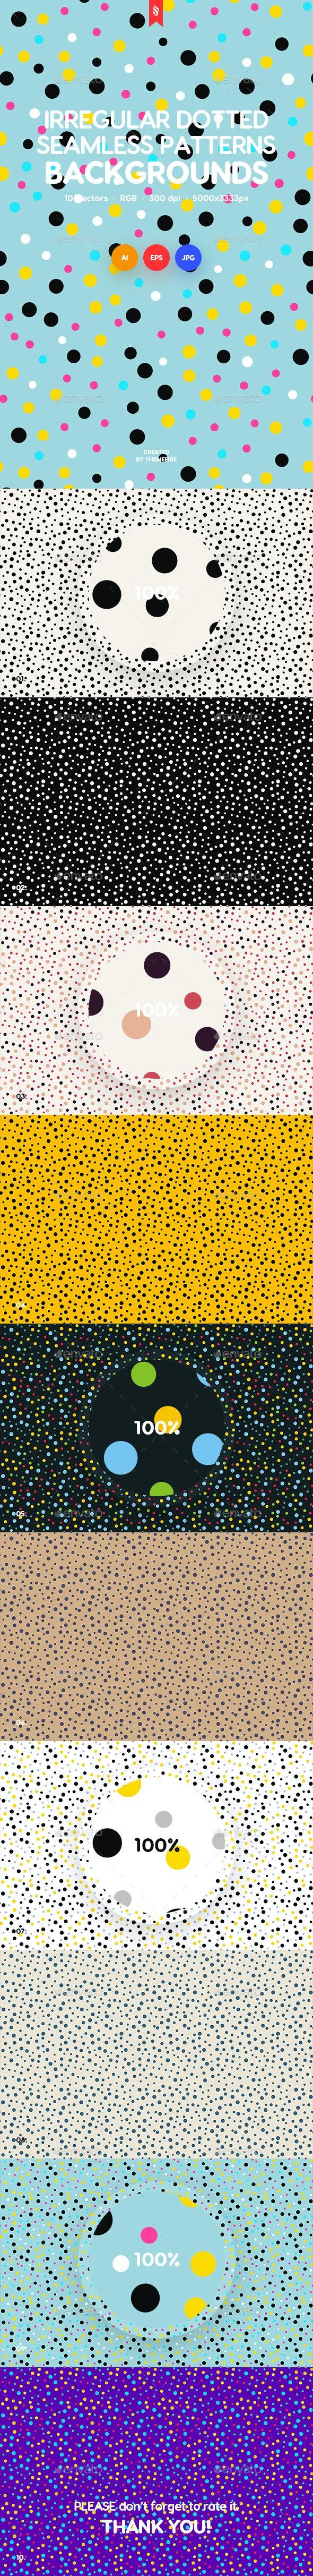 Colored Irregular Polka Dots Seamless Patterns / Backgrounds - Patterns Backgrounds